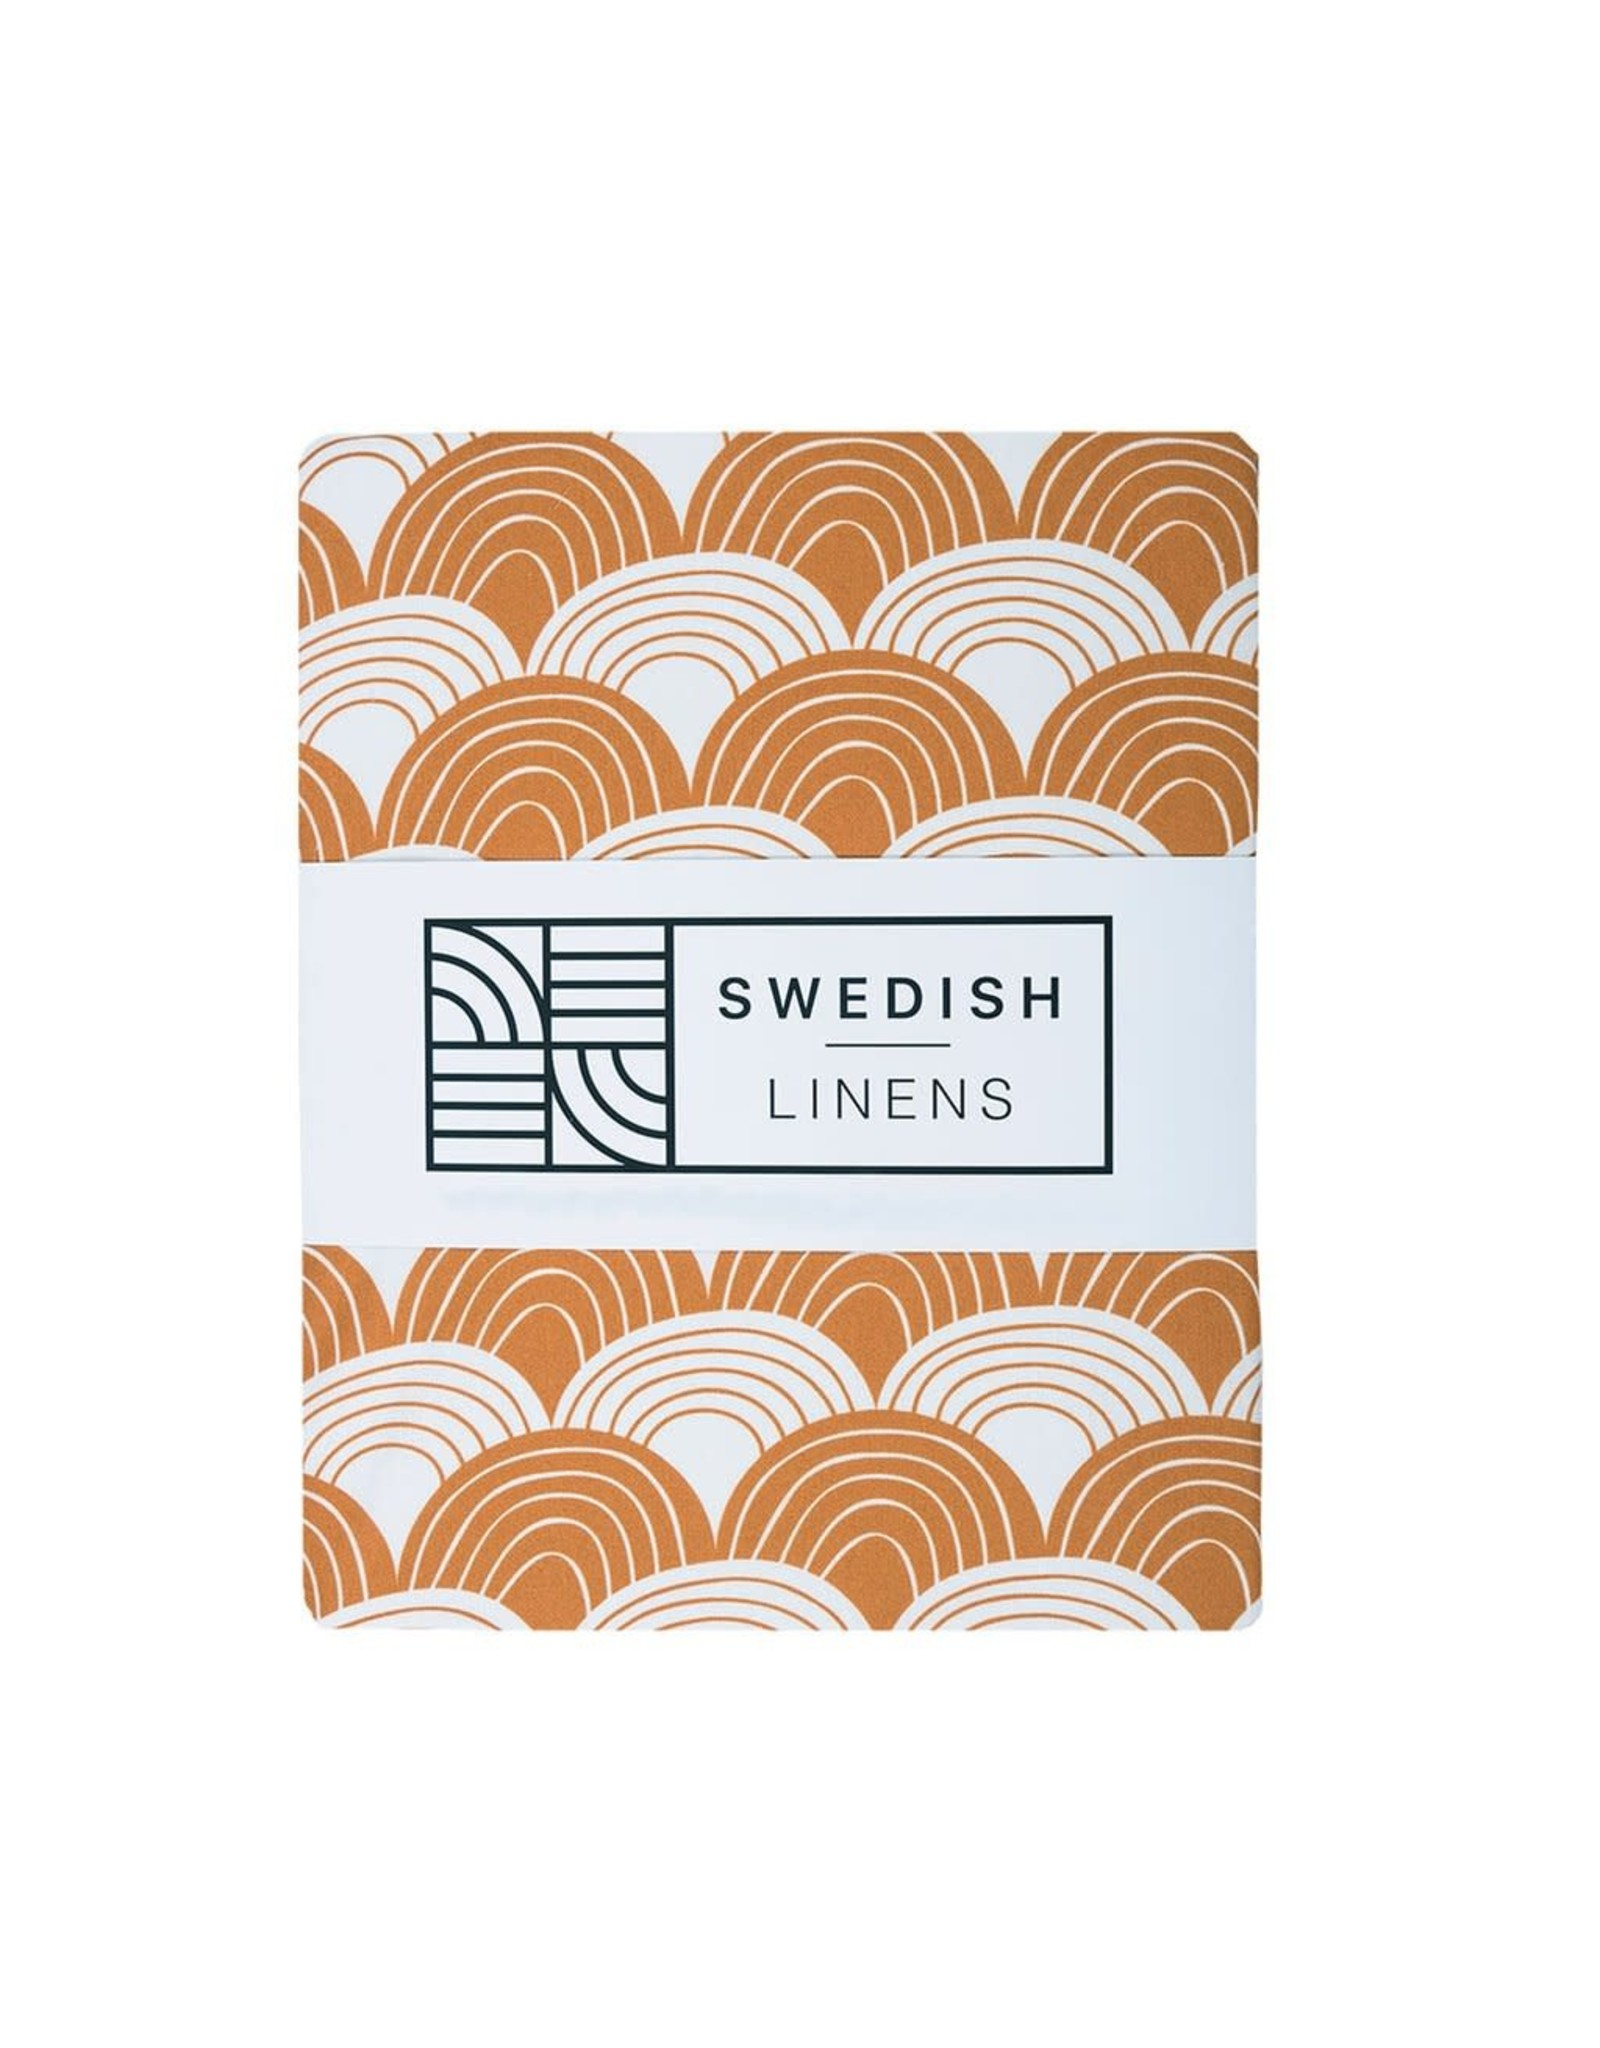 Swedish Linens Swedish Linens hoeslaken Rainbows cinnamon brown, 70 x 160 cm